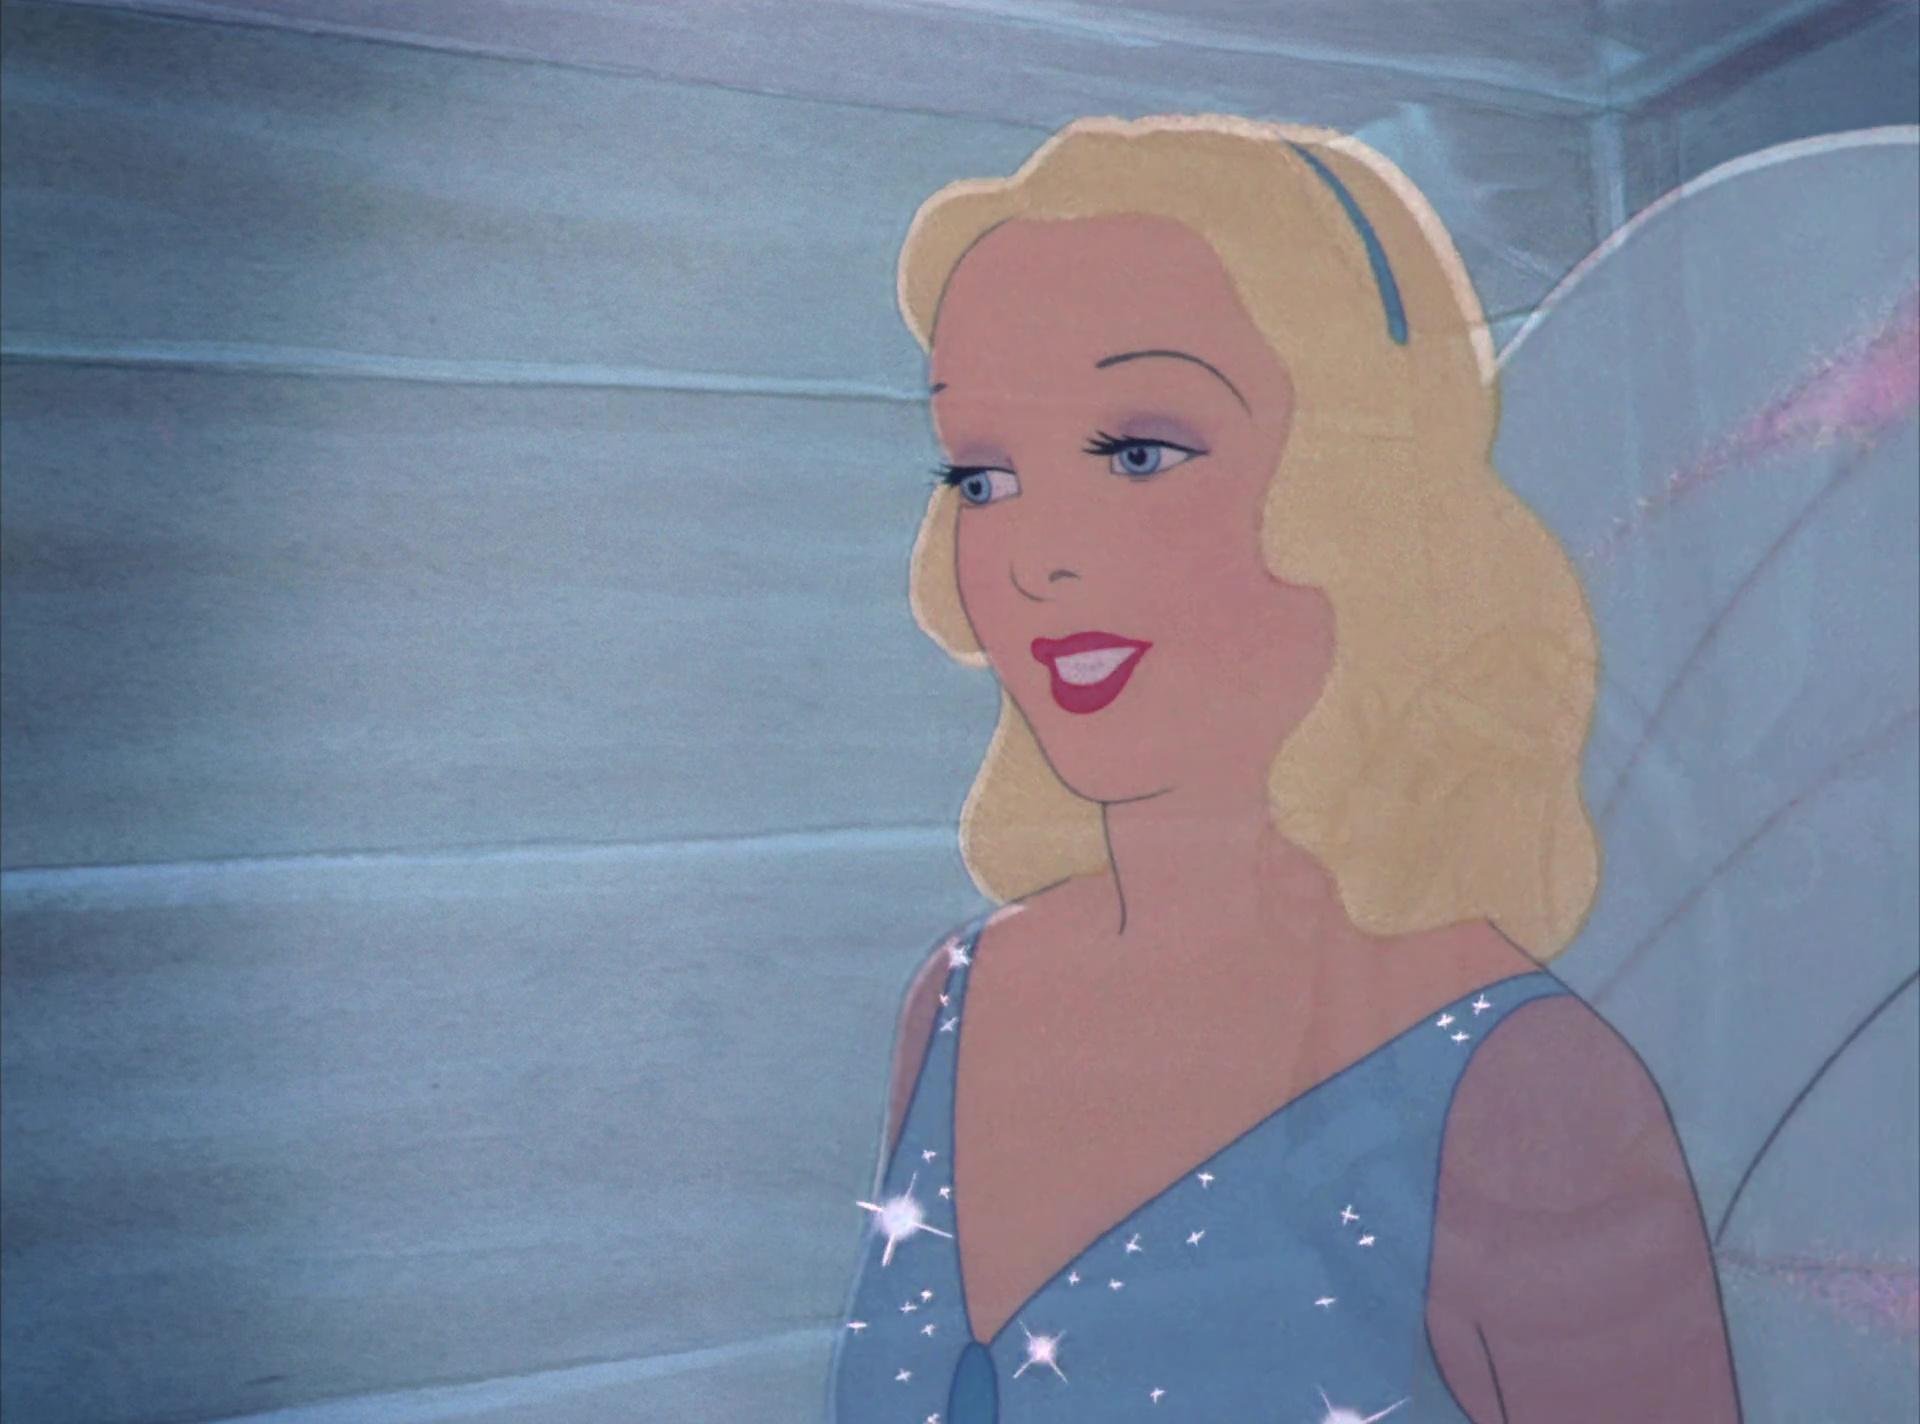 fée bleue blue fairy disney personnage character pinocchio